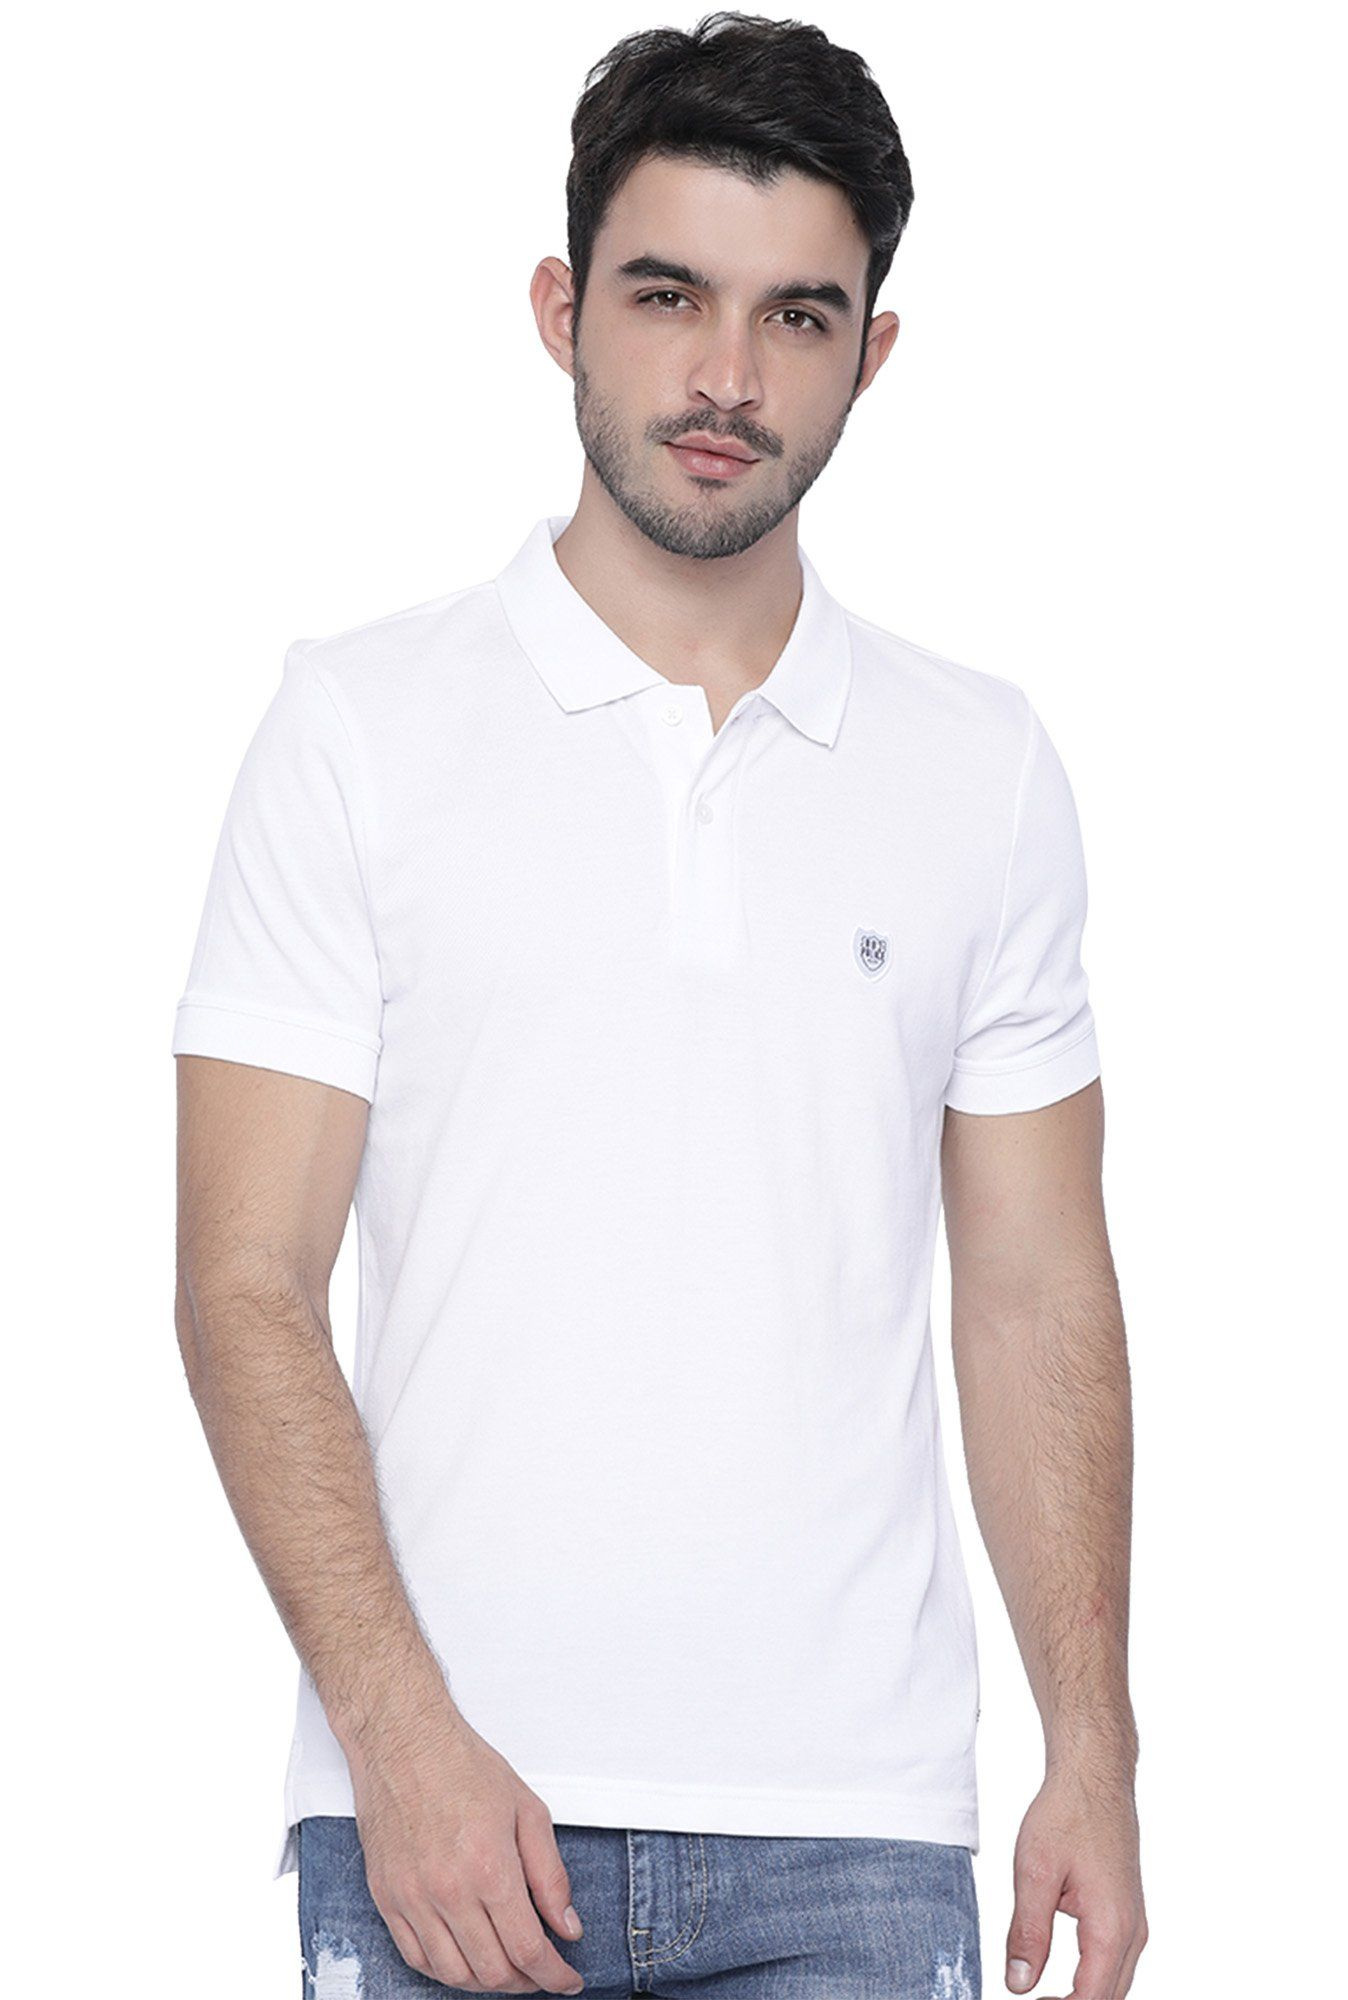 dcfa81792 883 Police White Half Sleeves Slim Fit Cotton T-Shirt -